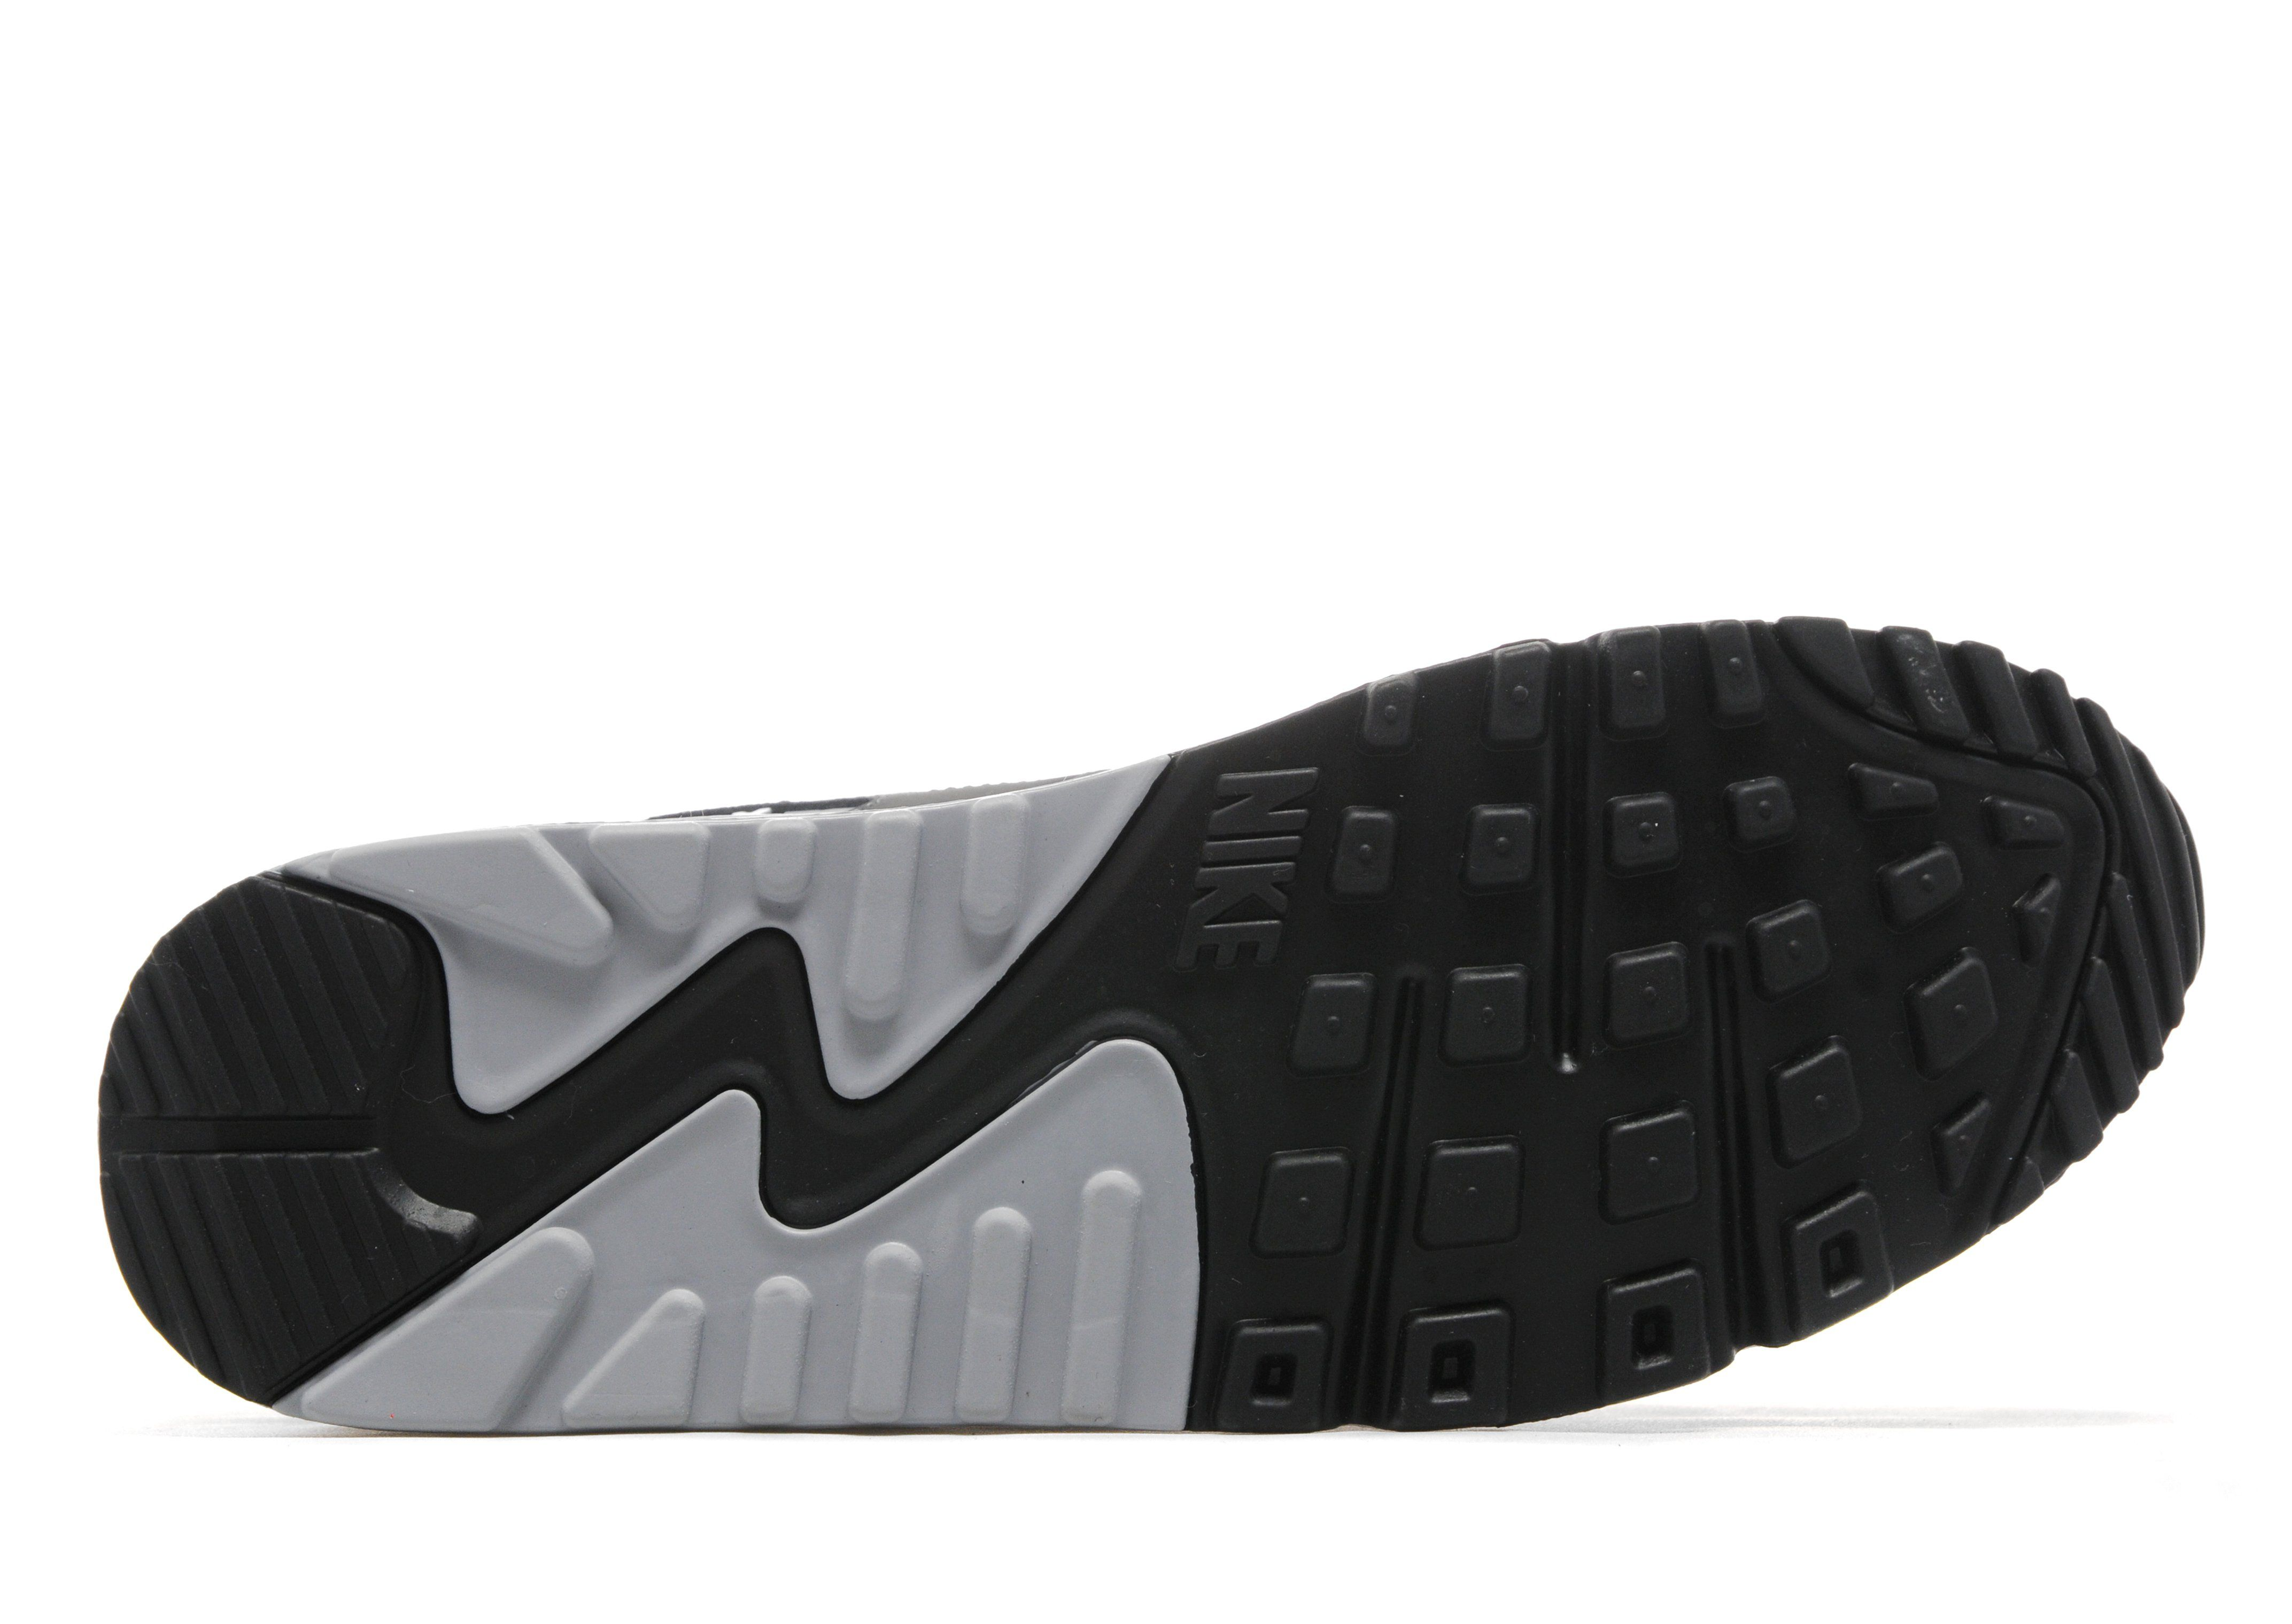 takfw Nike Air Max 90 | JD Sports